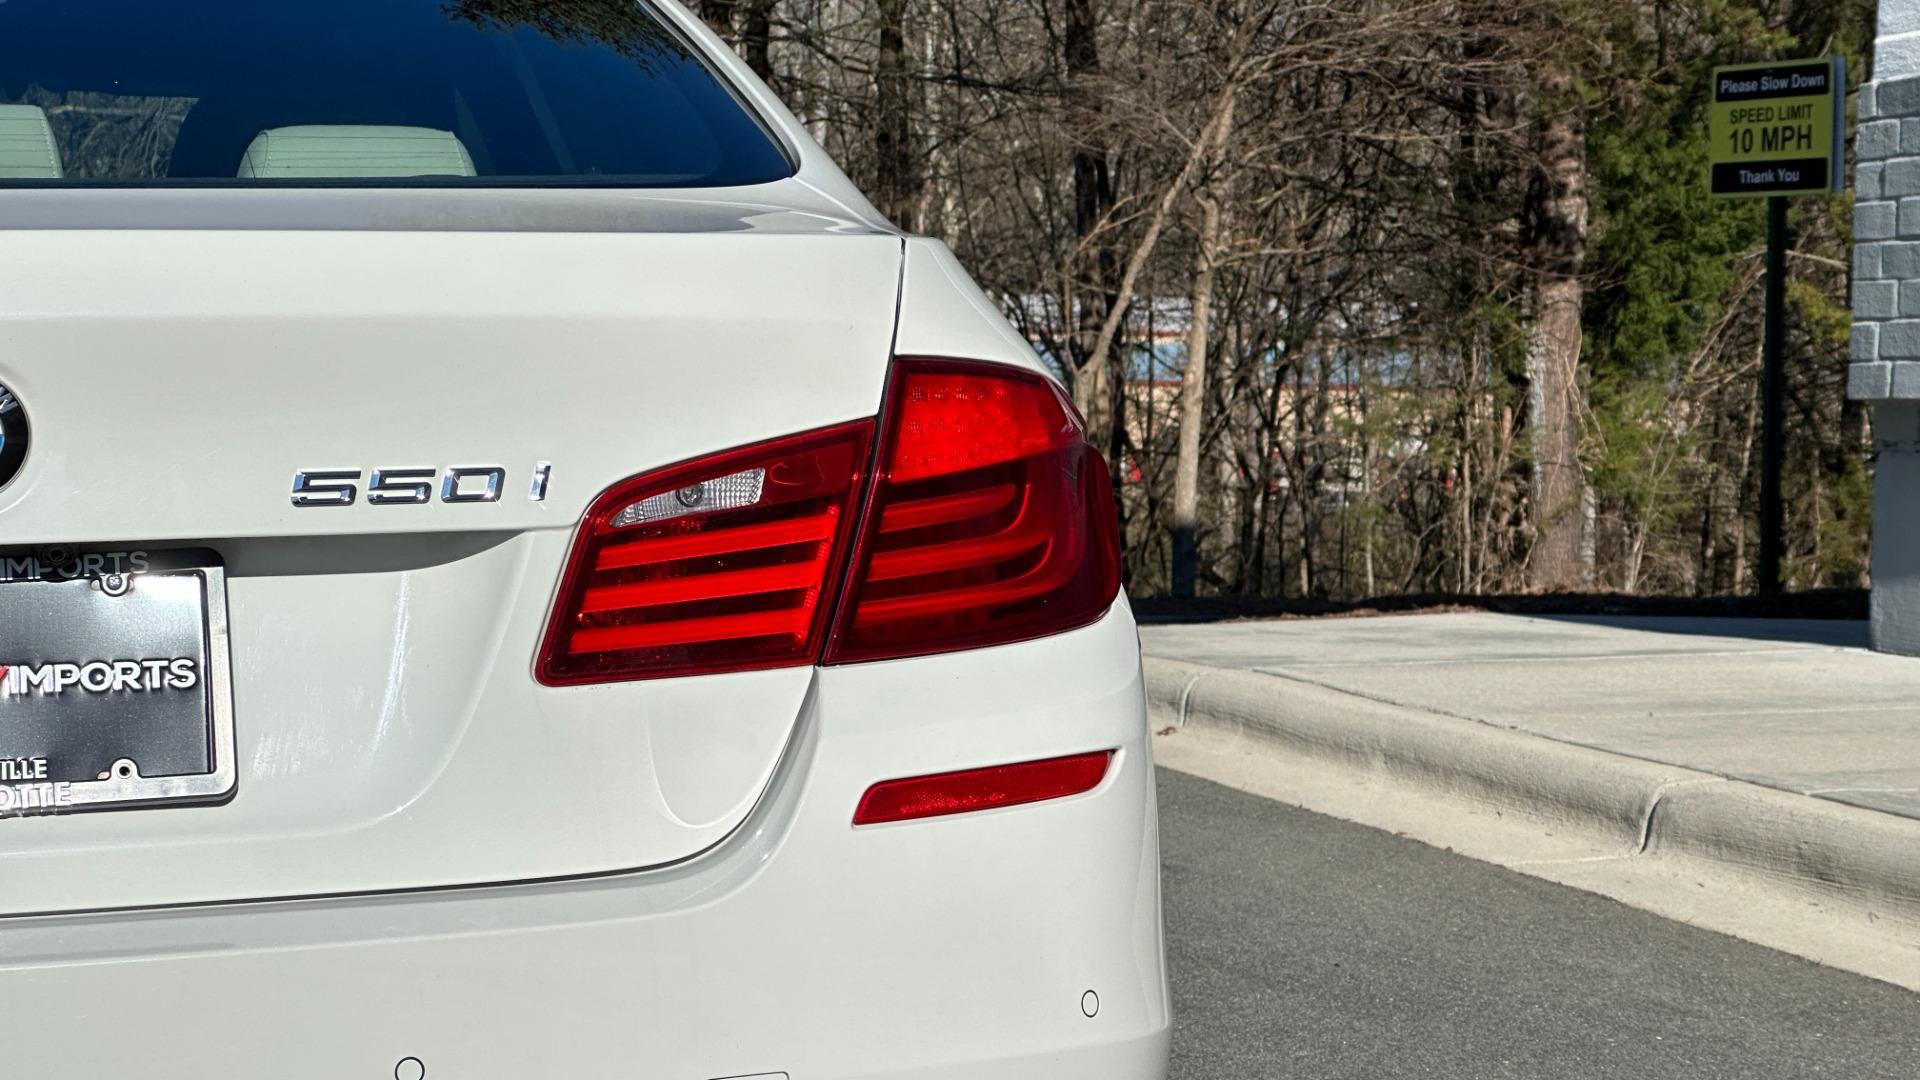 Used 2012 BMW 5 SERIES 550I M SPORT / NAV / CONV PKG / SUNROOF / PREM SND / REARVIEW for sale Sold at Formula Imports in Charlotte NC 28227 71